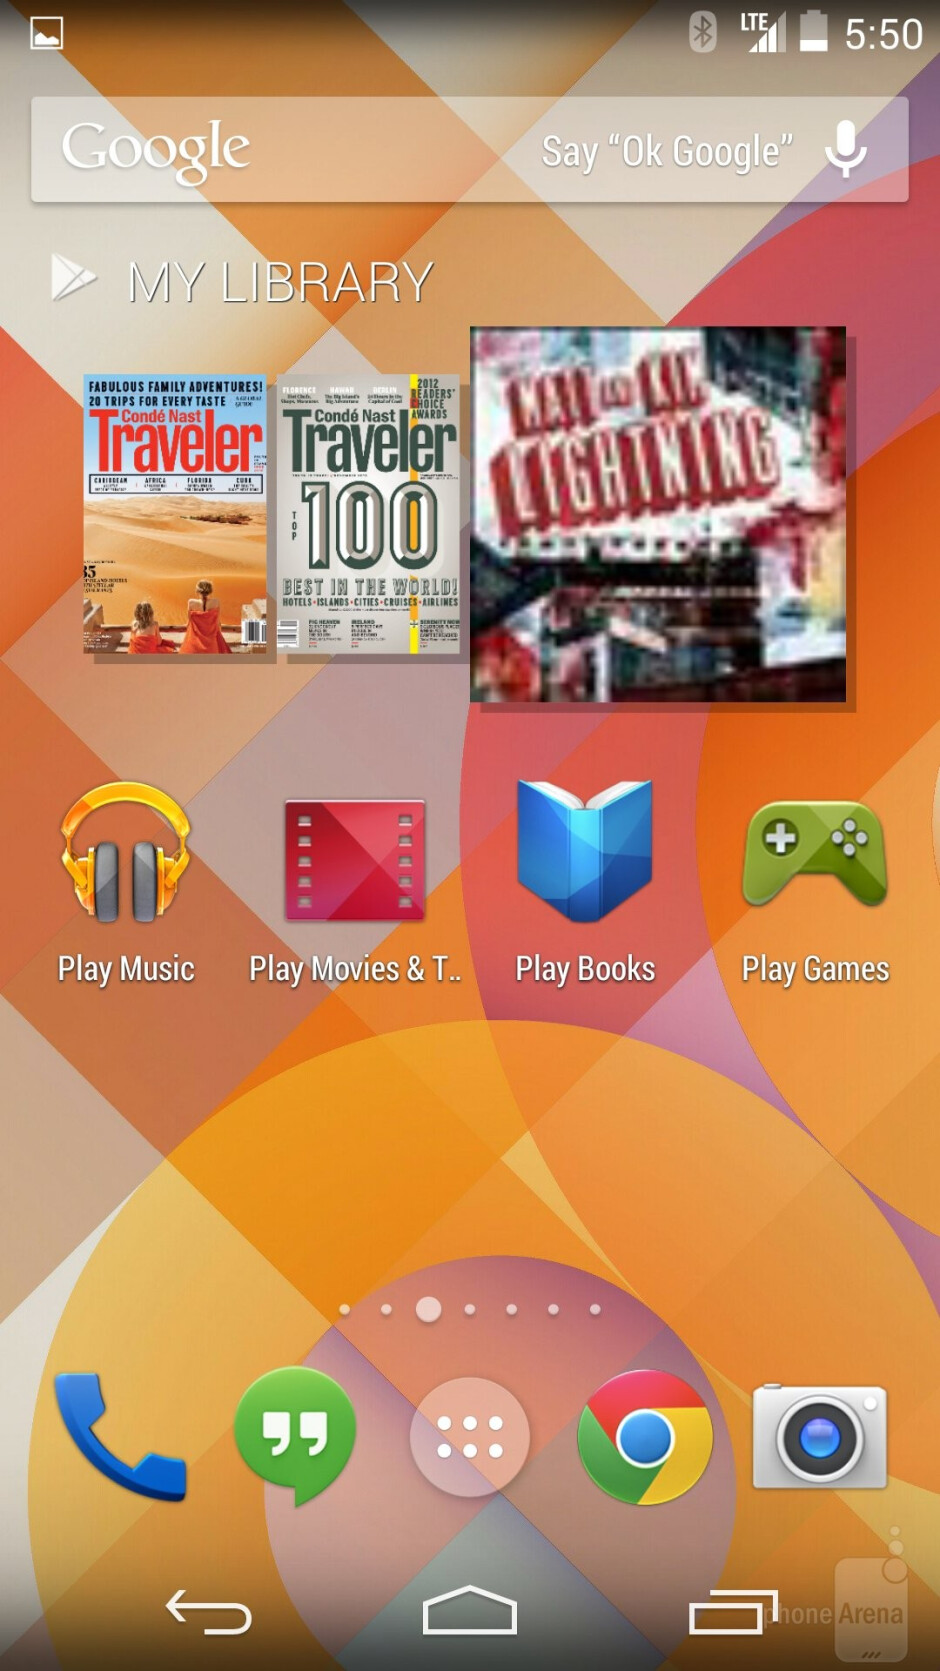 Interface of the Google Nexus 5 - Samsung Galaxy S5 vs Google Nexus 5